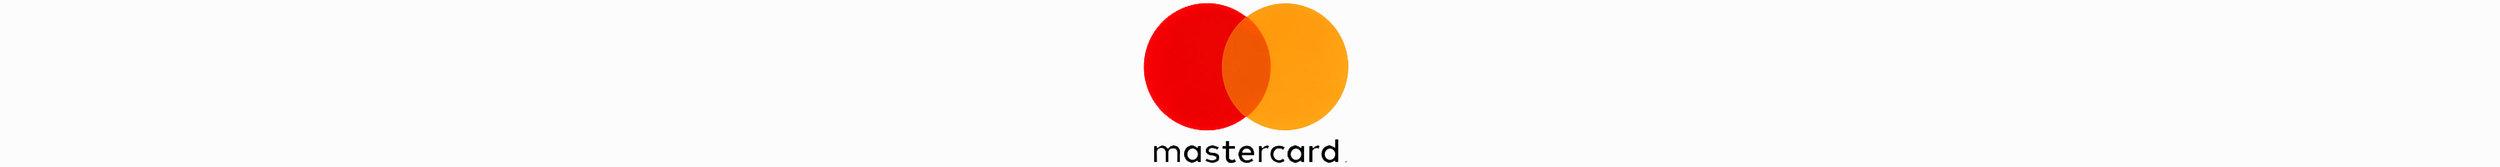 mastercard-770.jpg